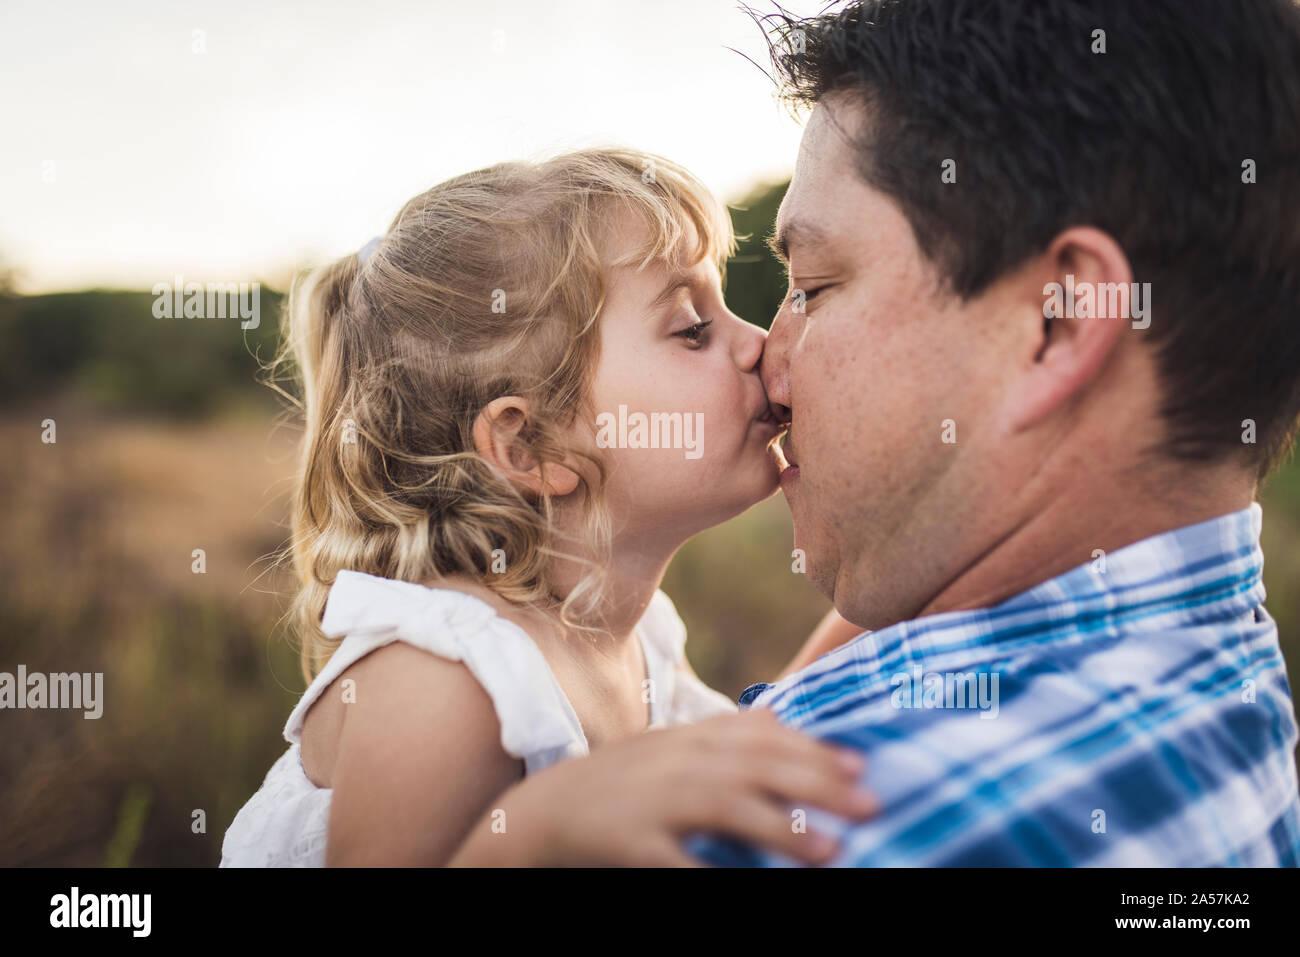 Im jungs bett sich küssen Beste freundin